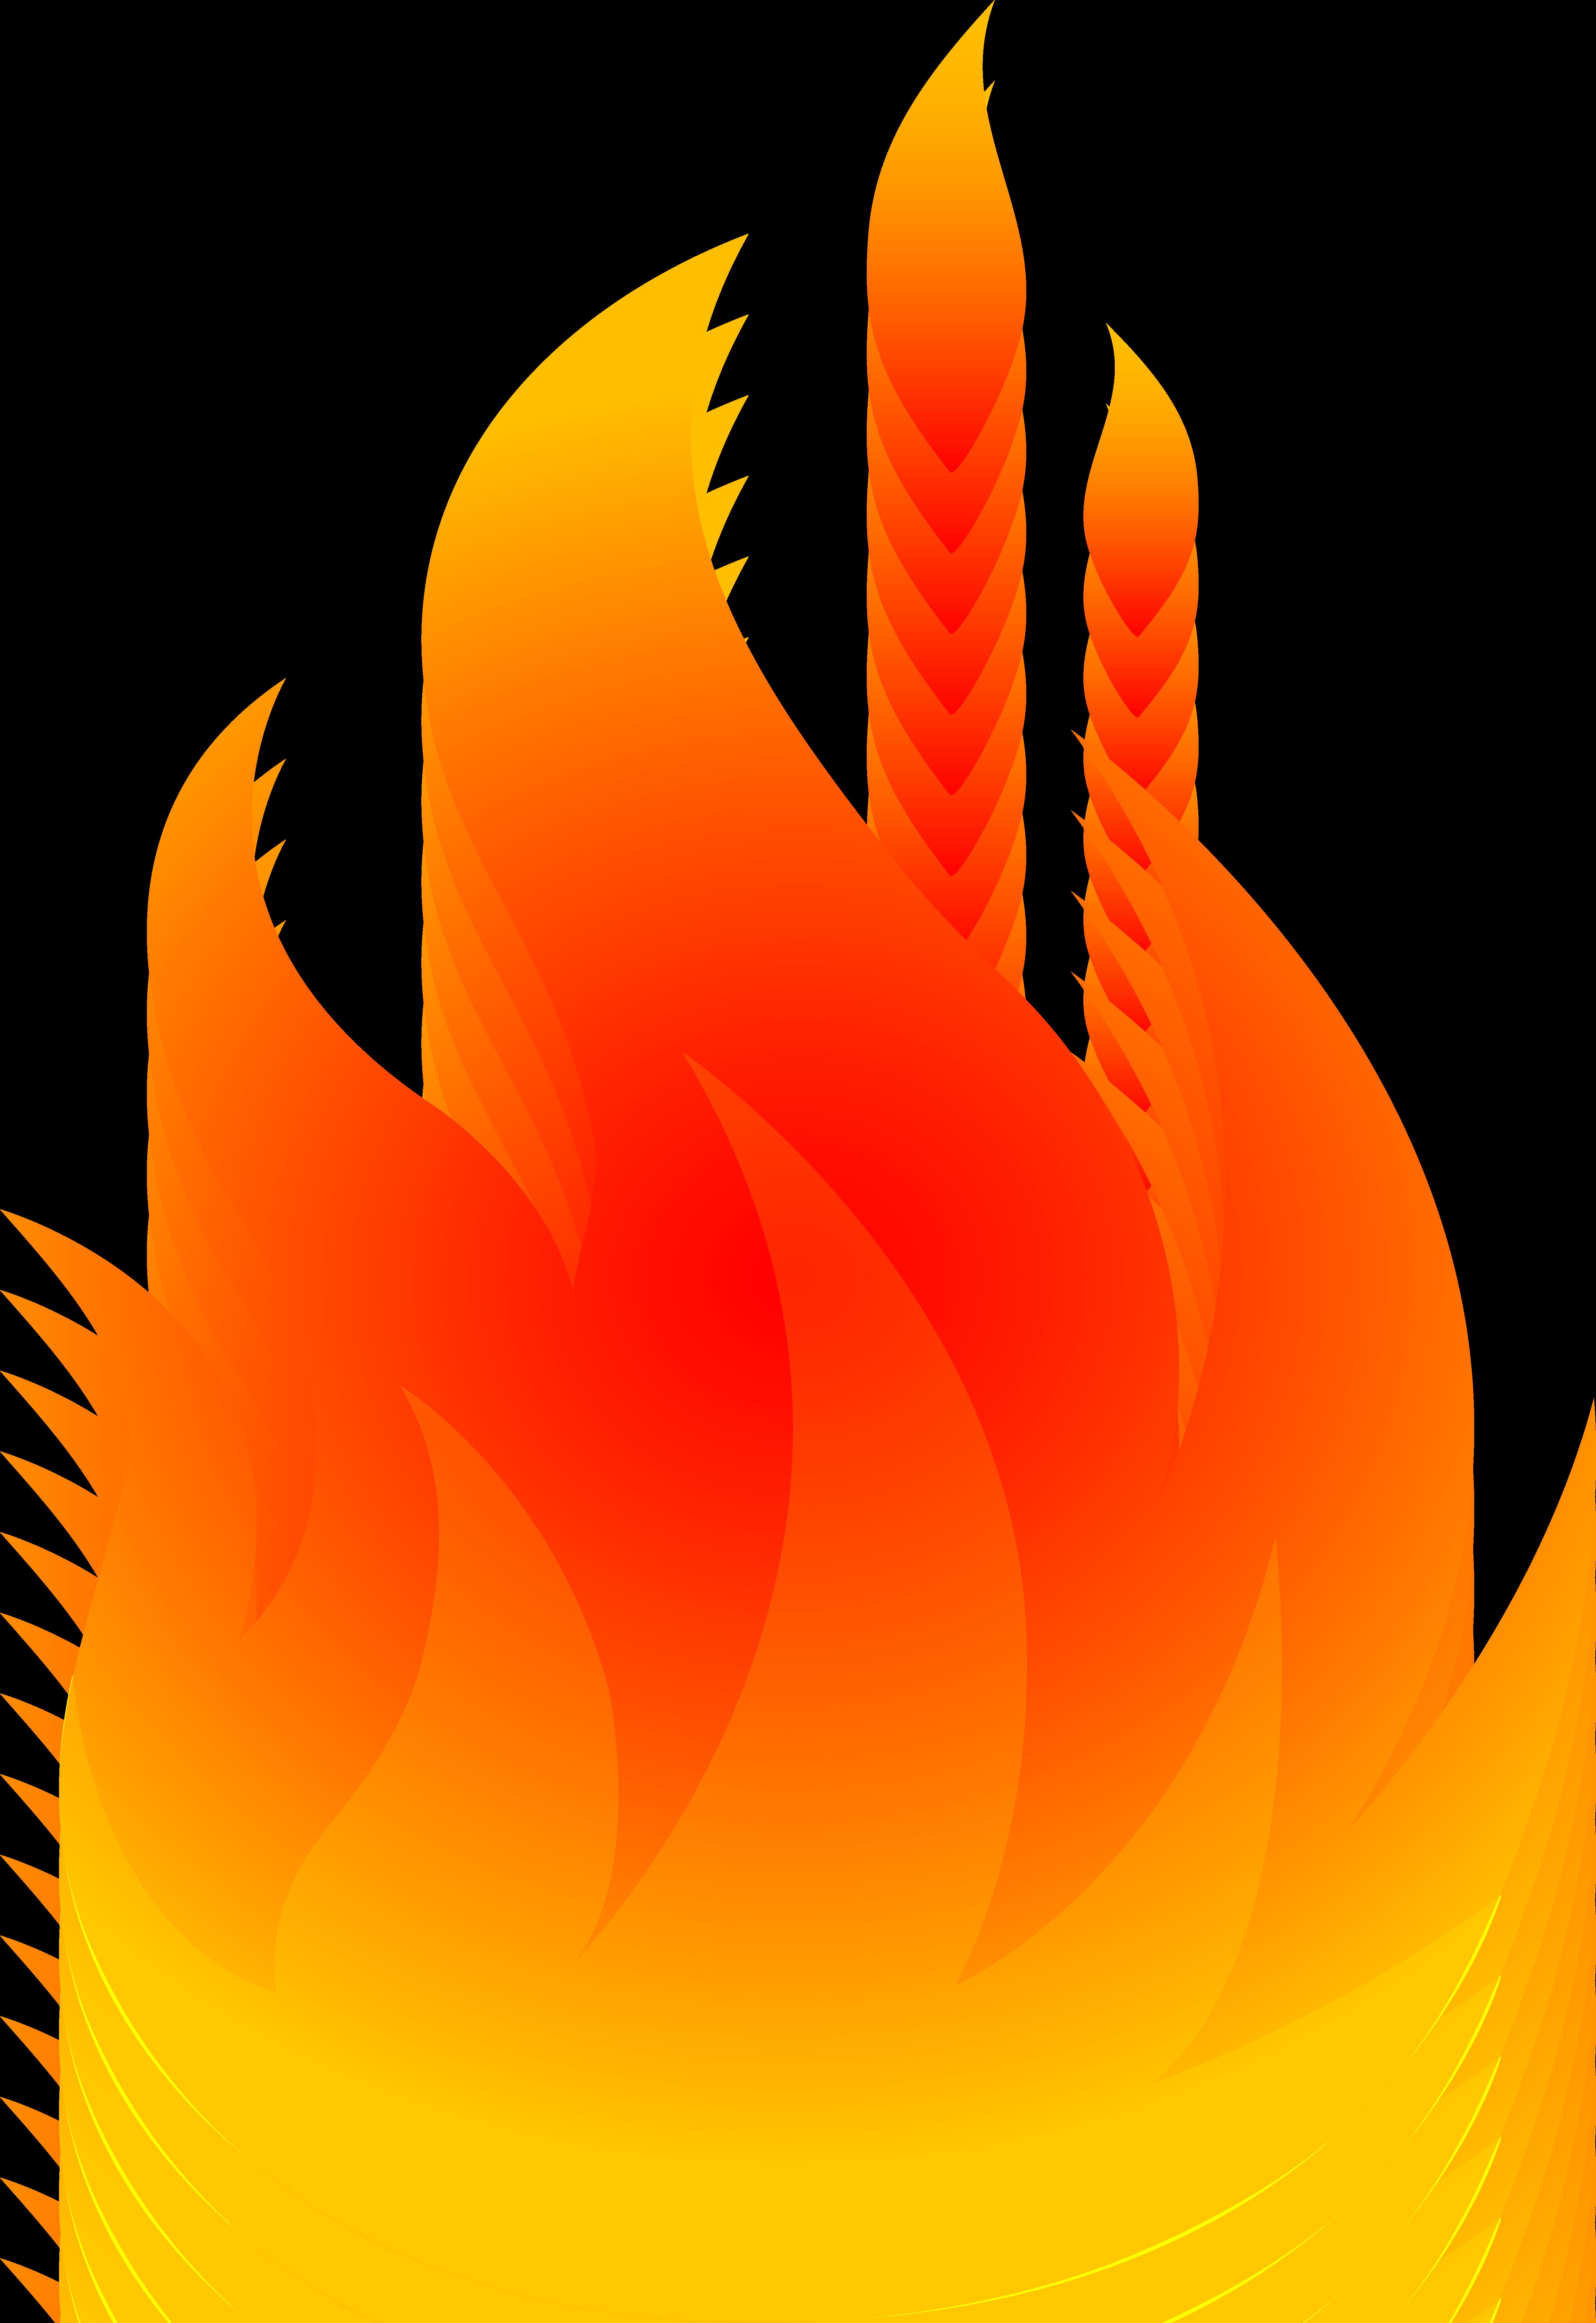 5084x7399 Top 67 Flame Clip Art